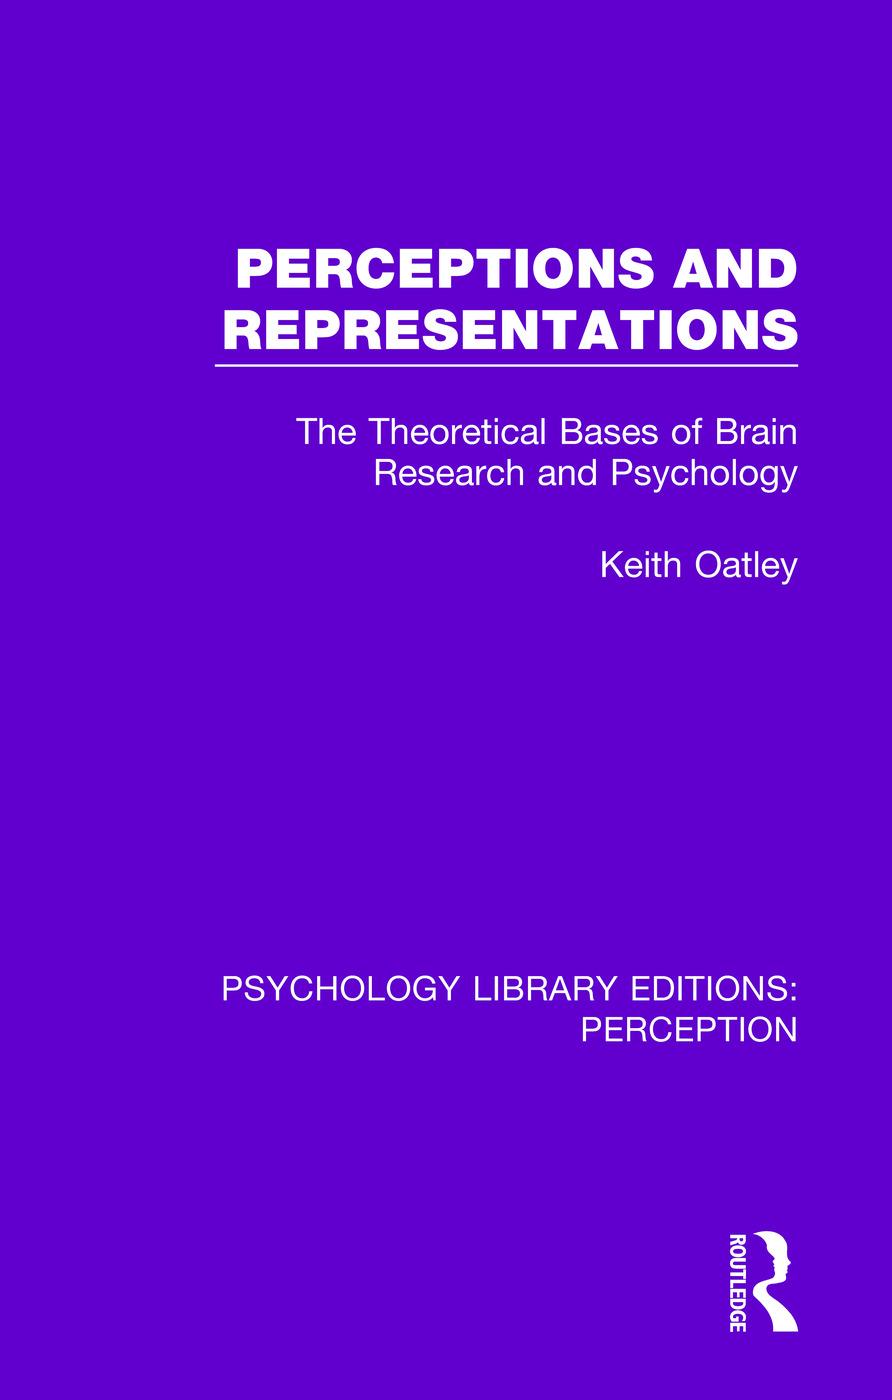 Perceptions and Representations